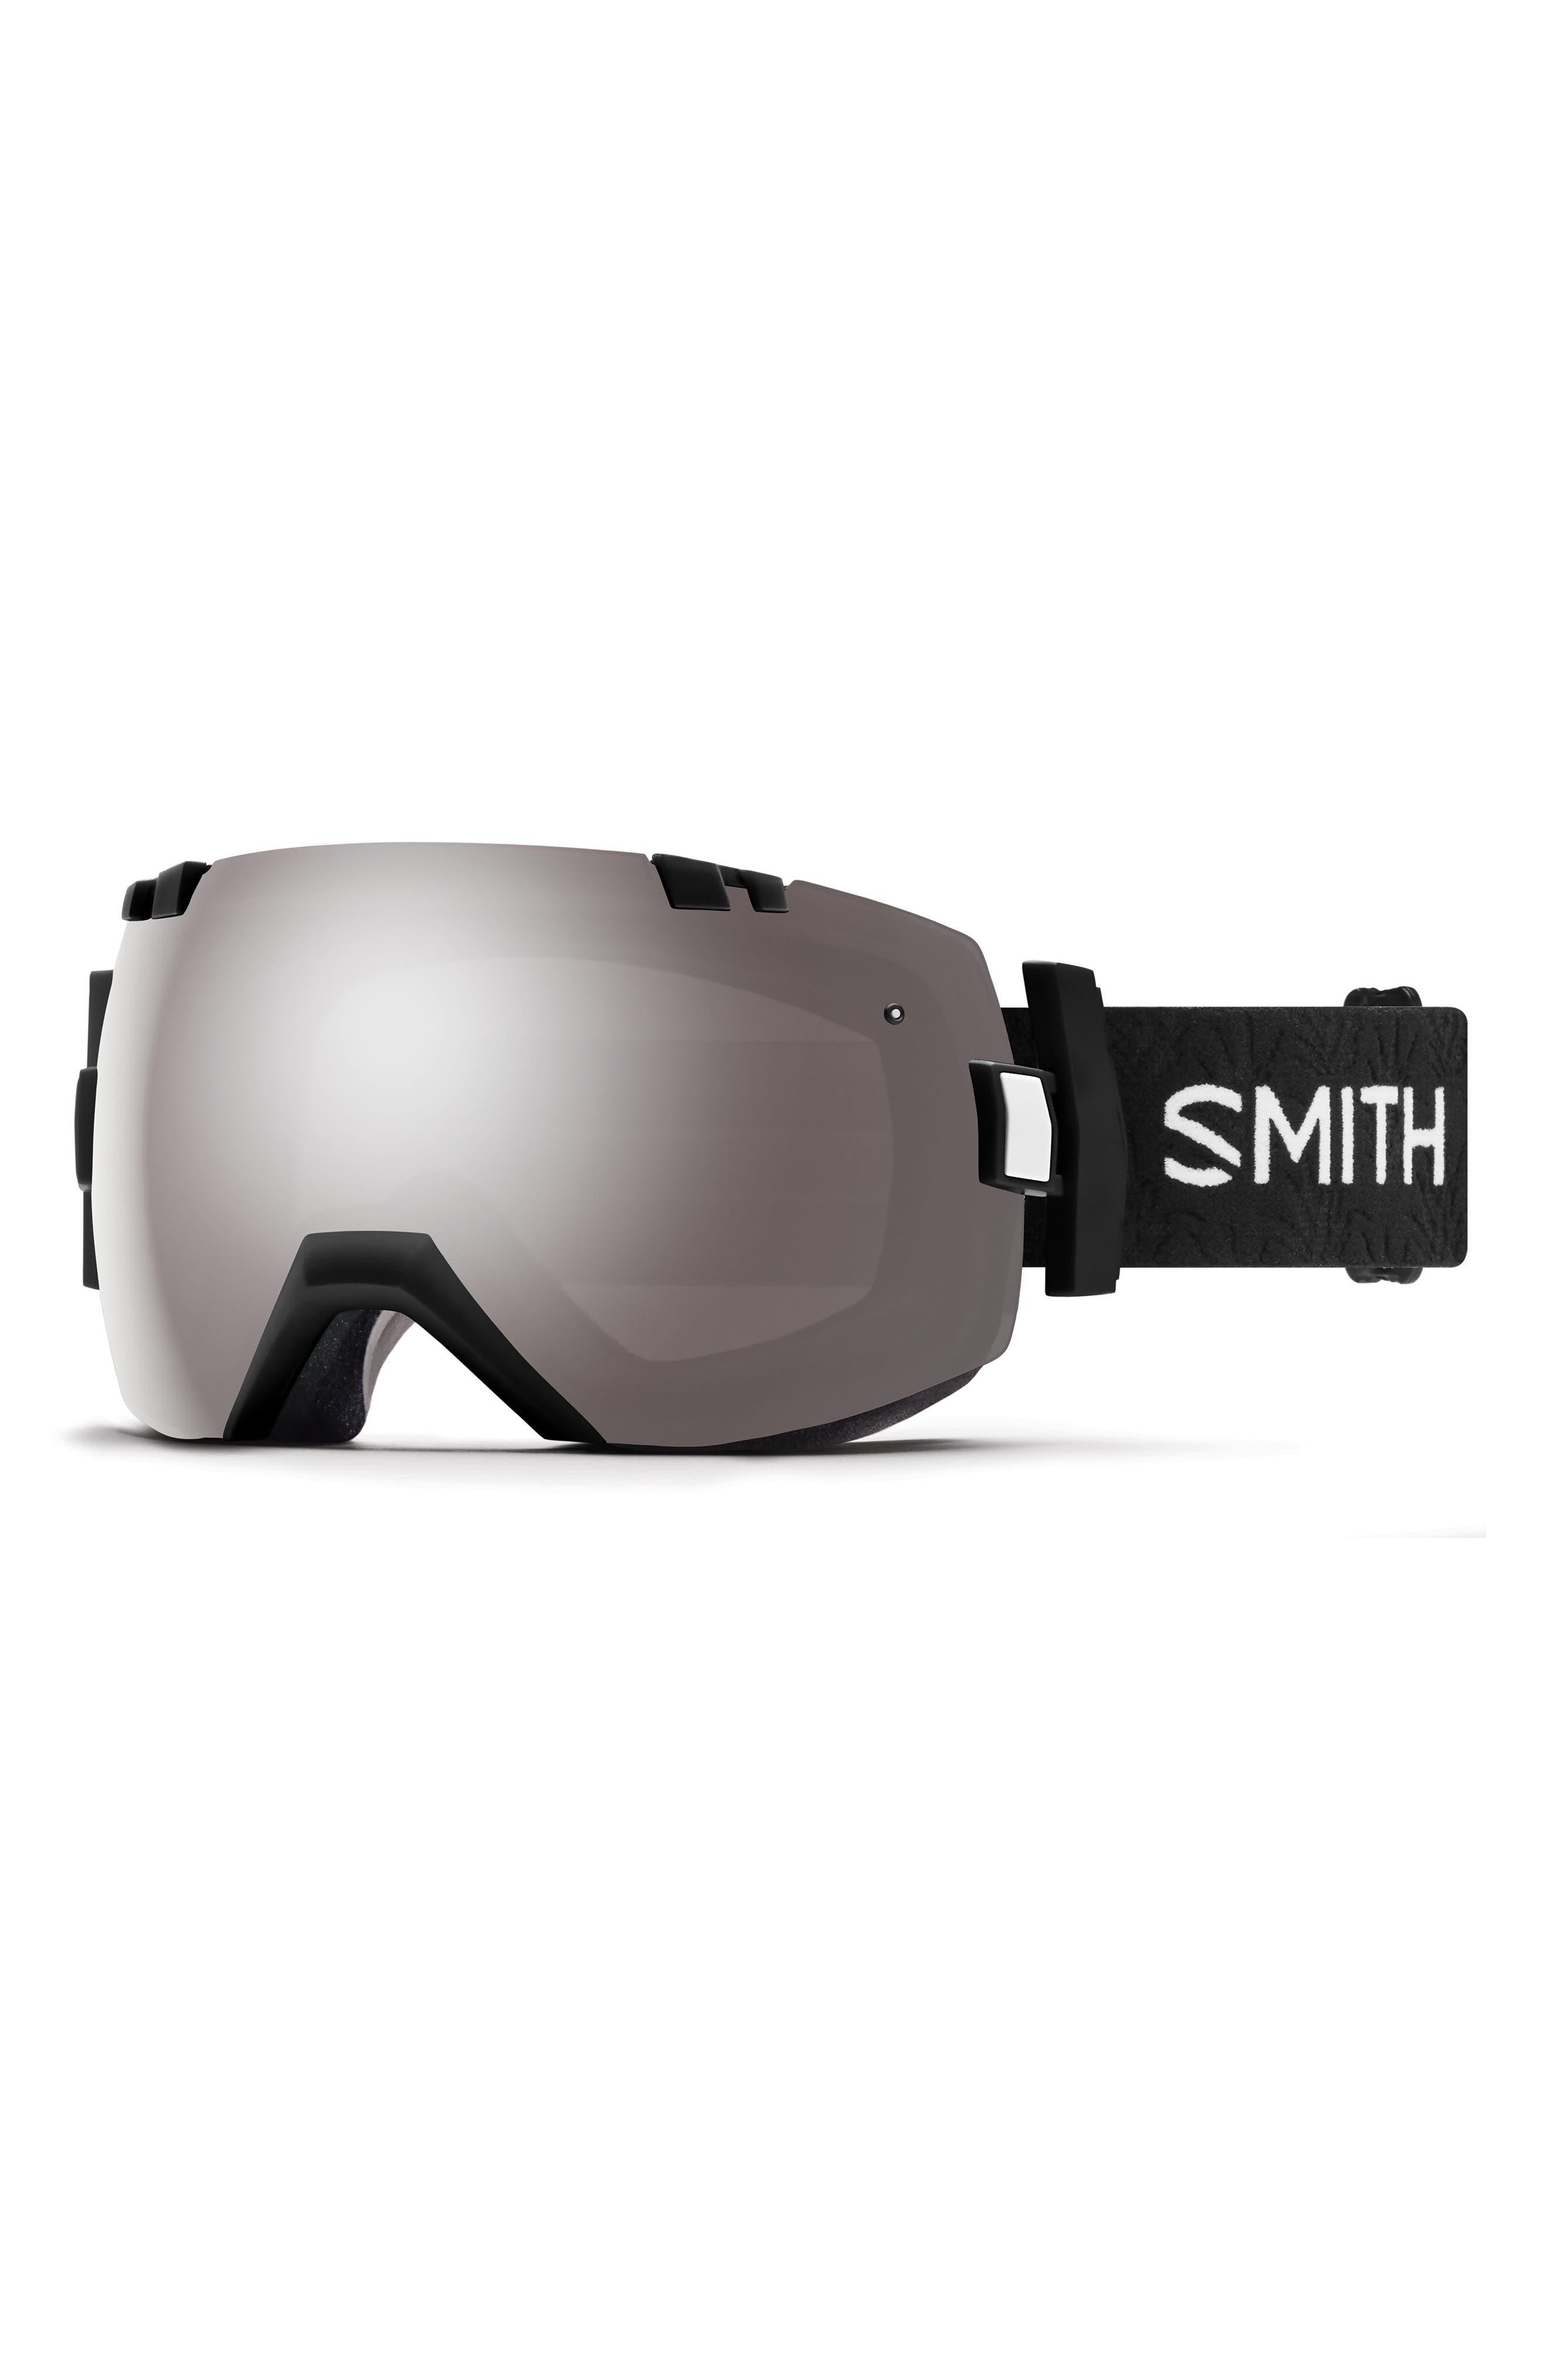 I/OX 205mm Chromapop Snow Goggles,                         Main,                         color, 001